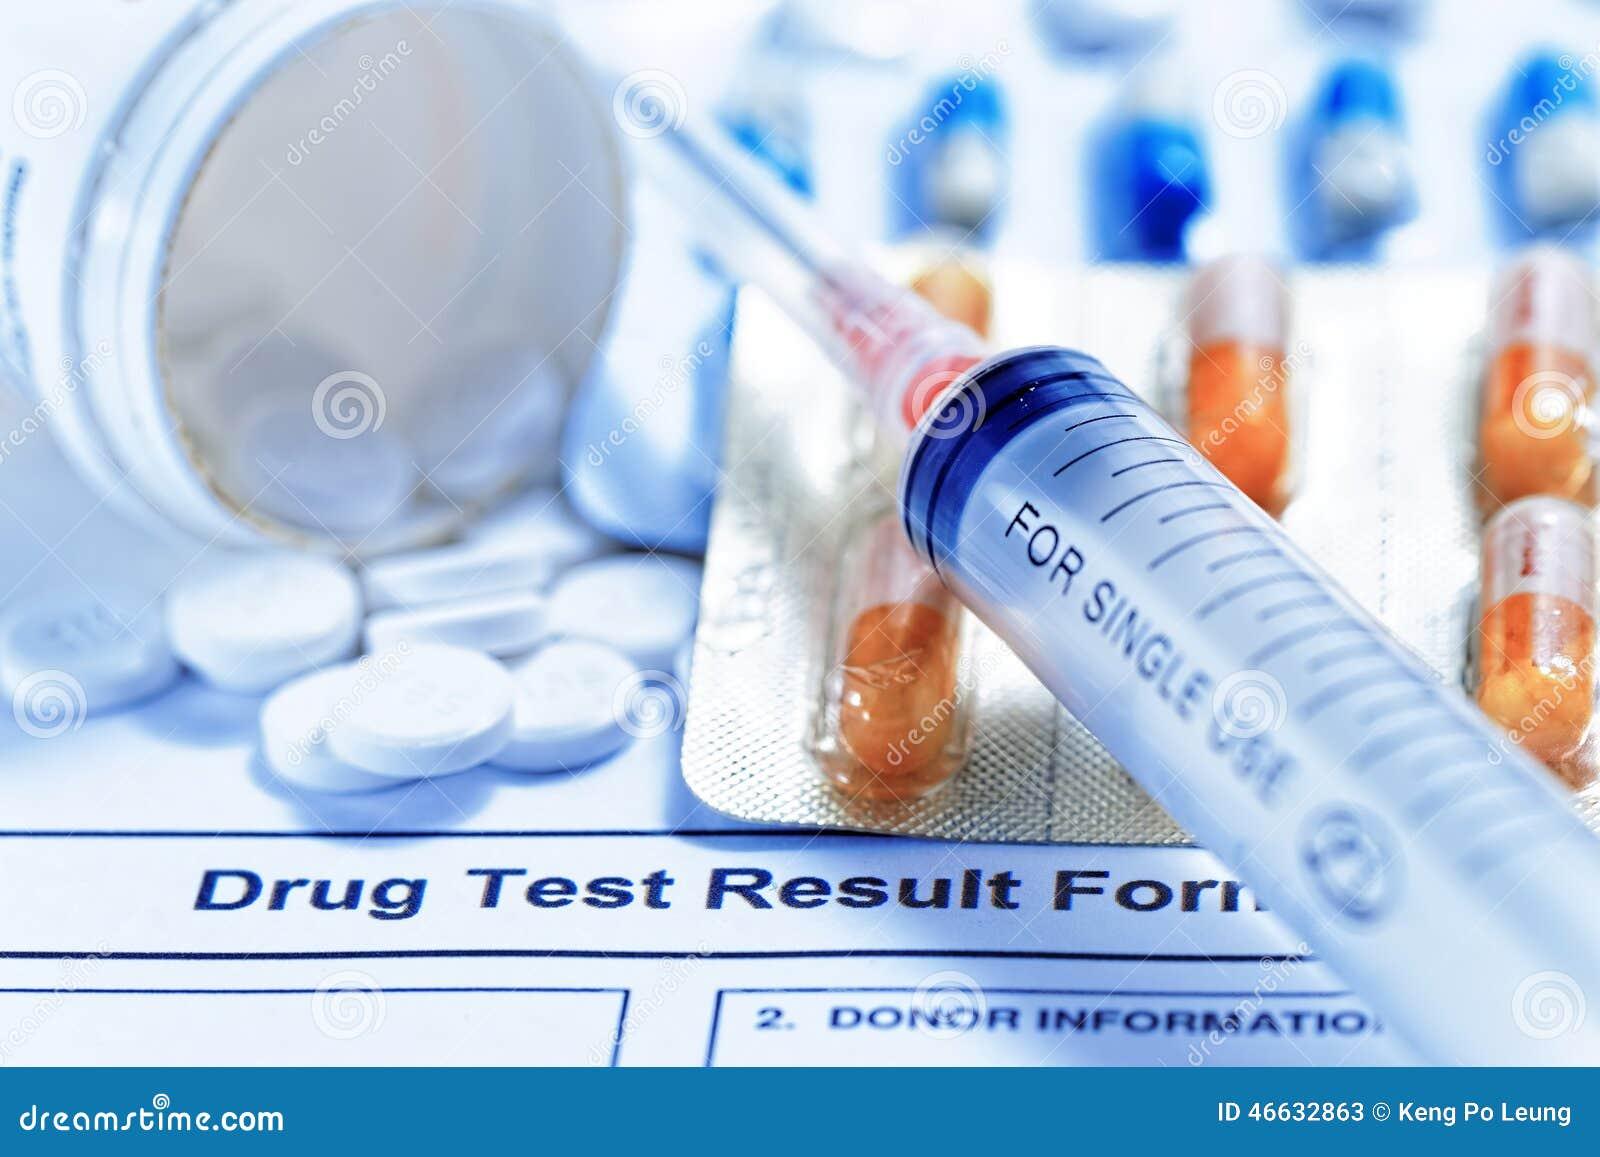 Starting a Drug Testing Center – Sample Business Plan Template